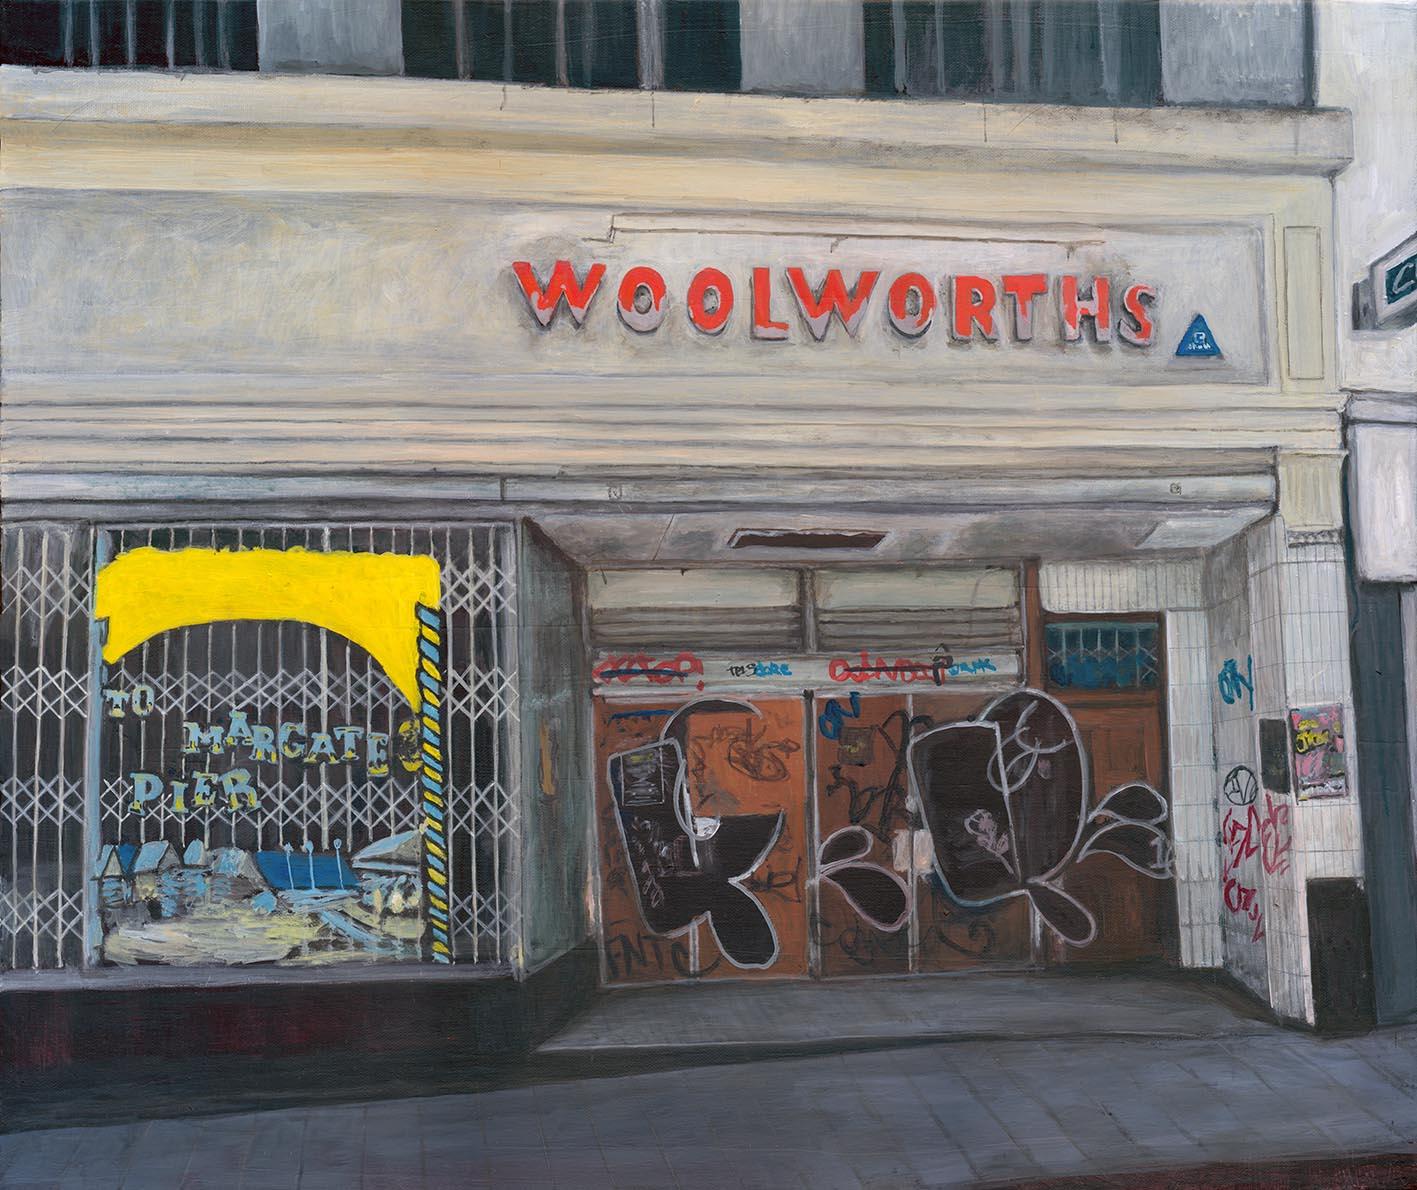 Woolies (Margate)